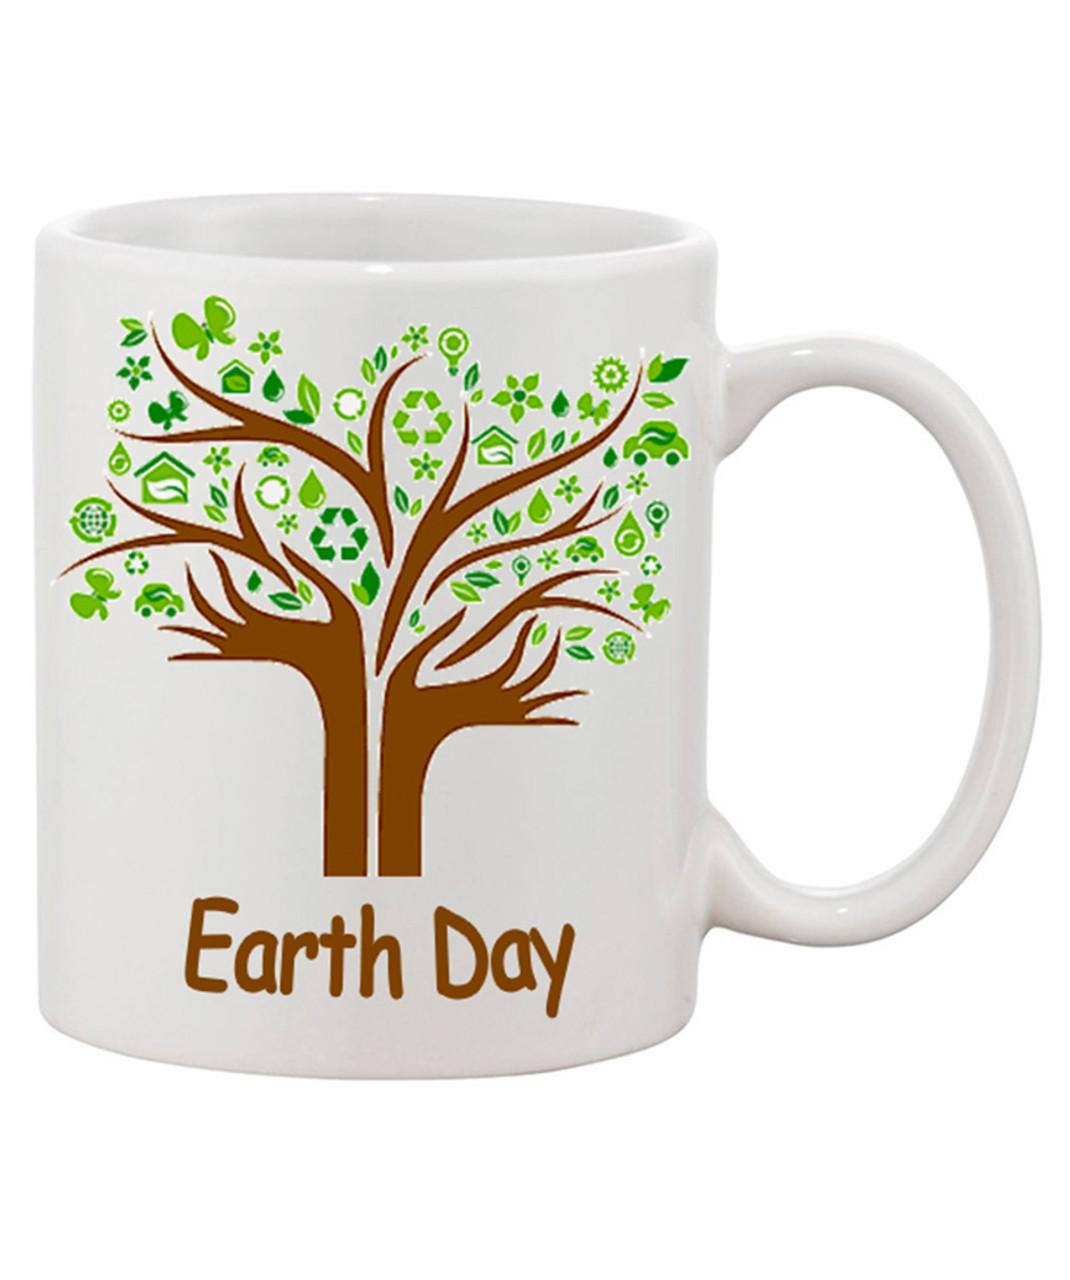 Earth Day Mug / Hands Extend Into A Beautiful Tree